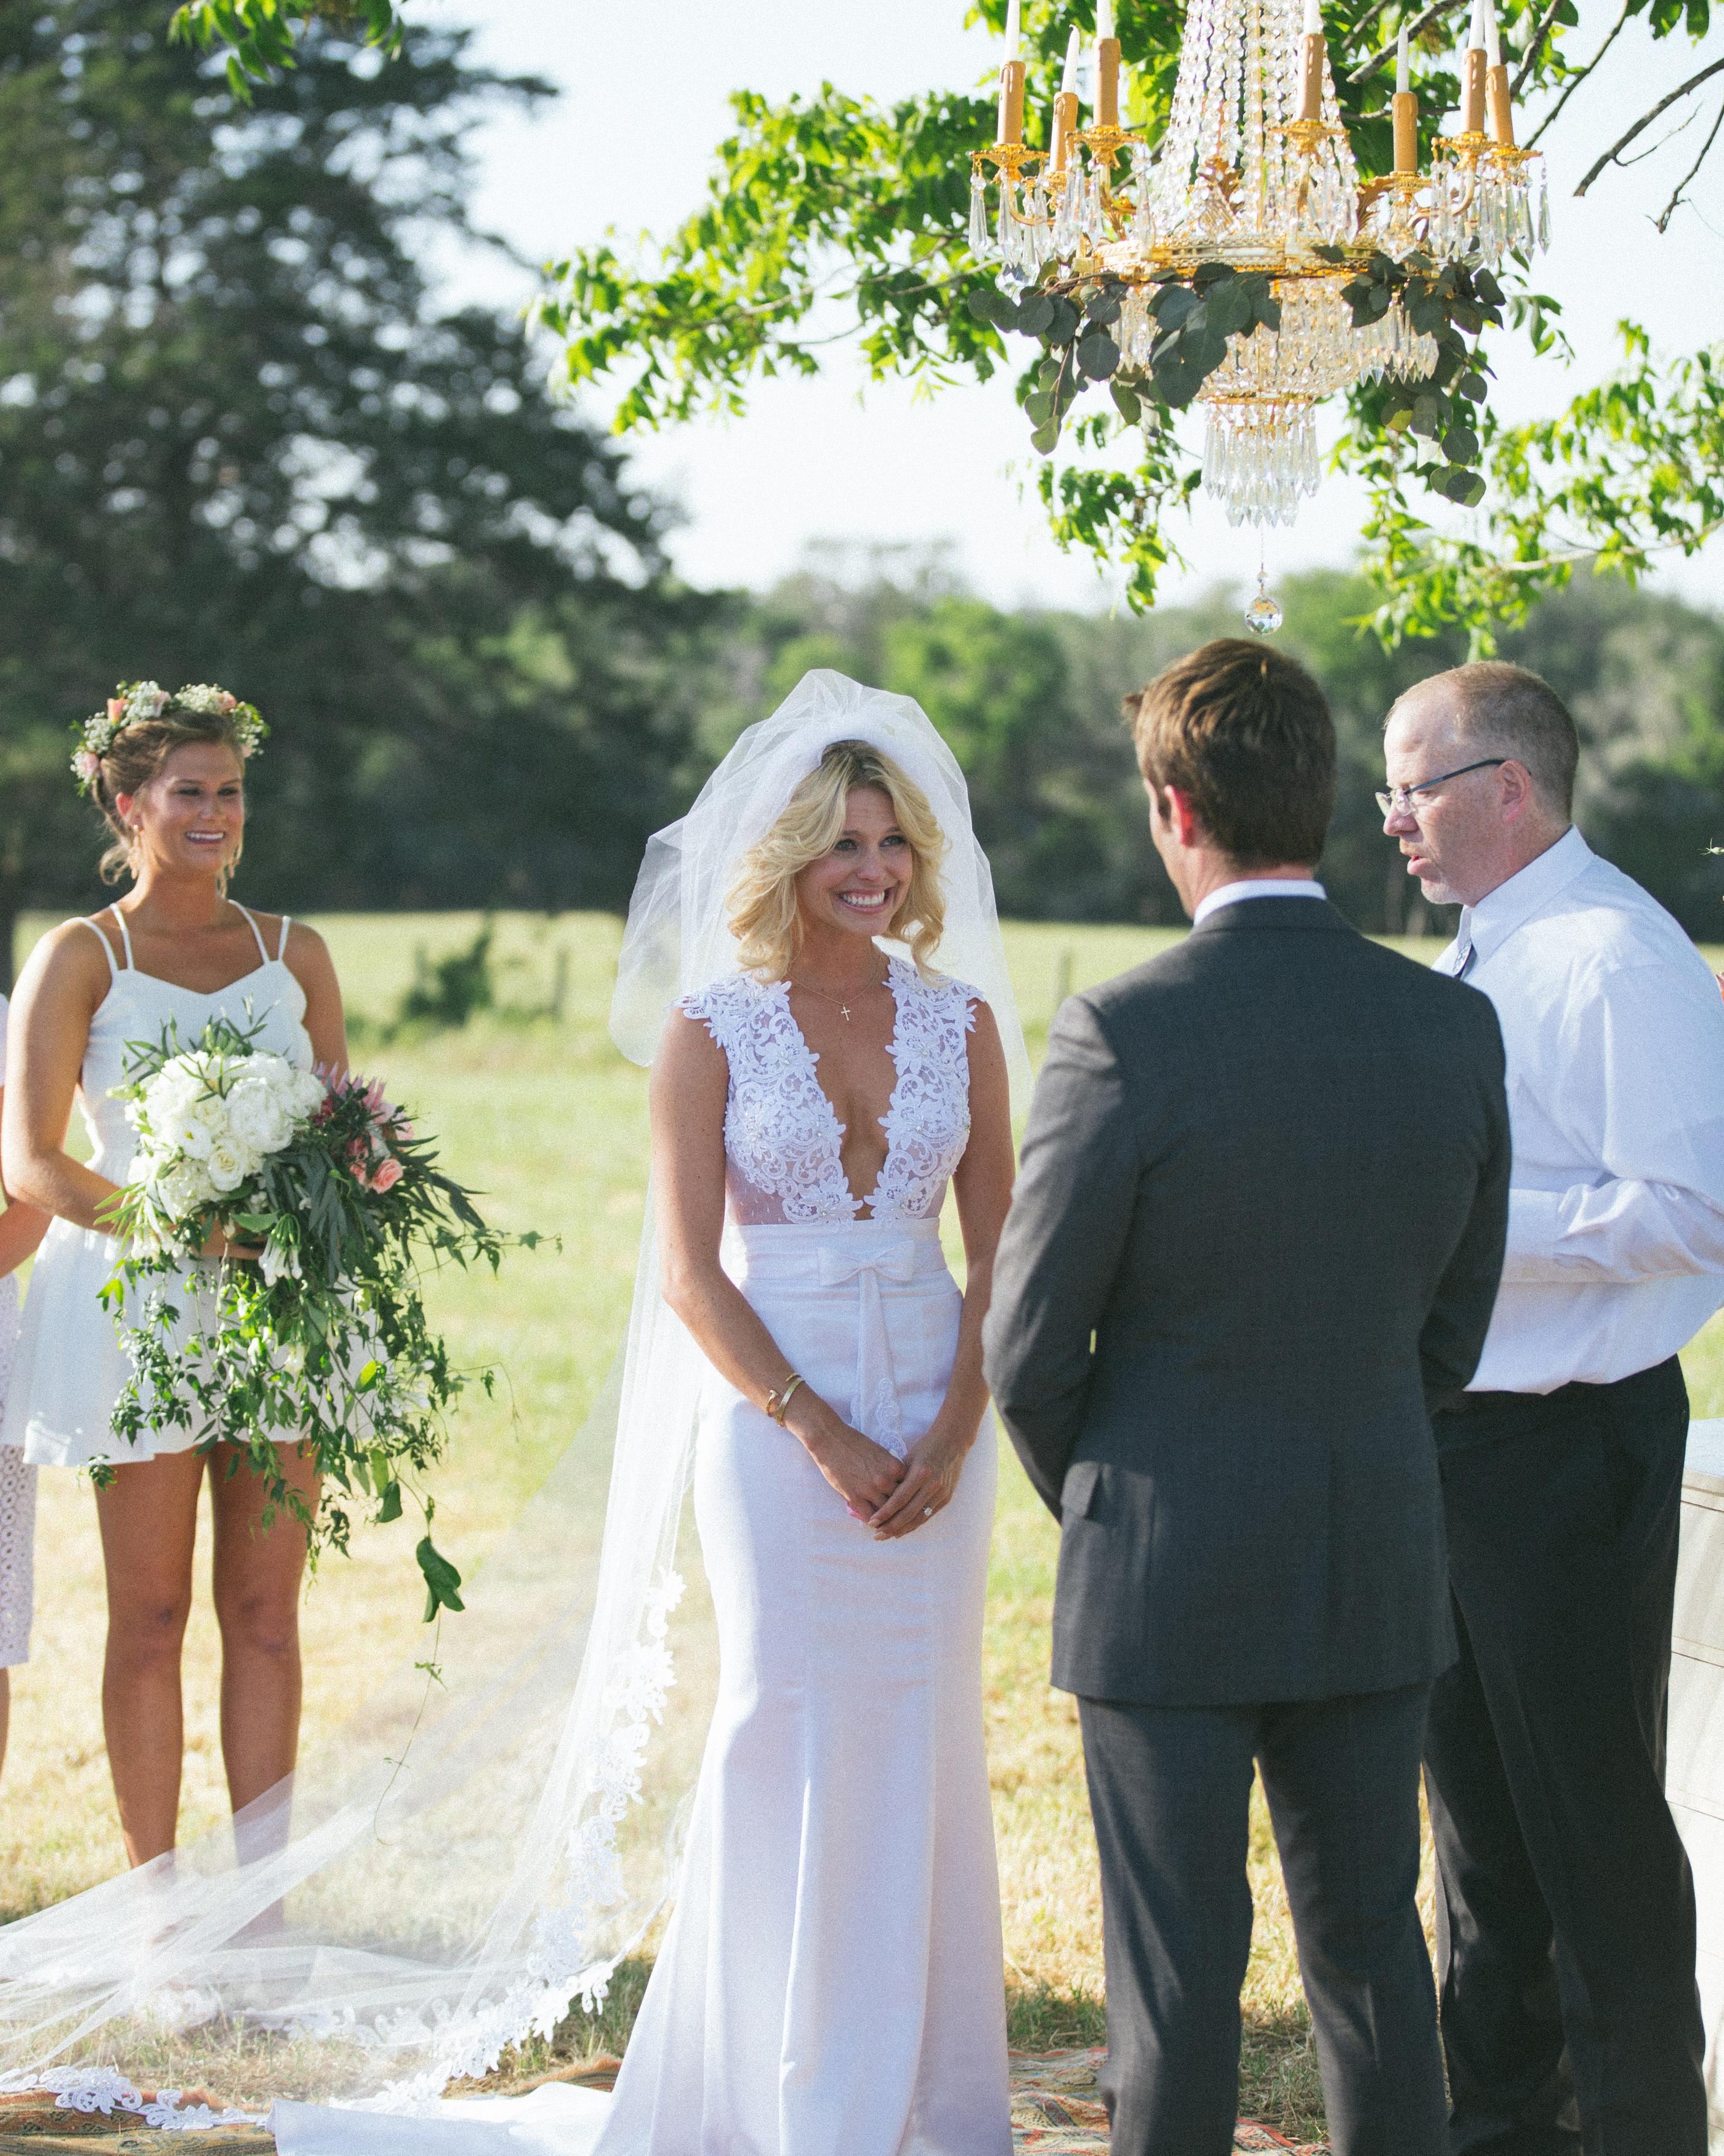 leah-michael-wedding-ceremony-0753-s111861-0515.jpg